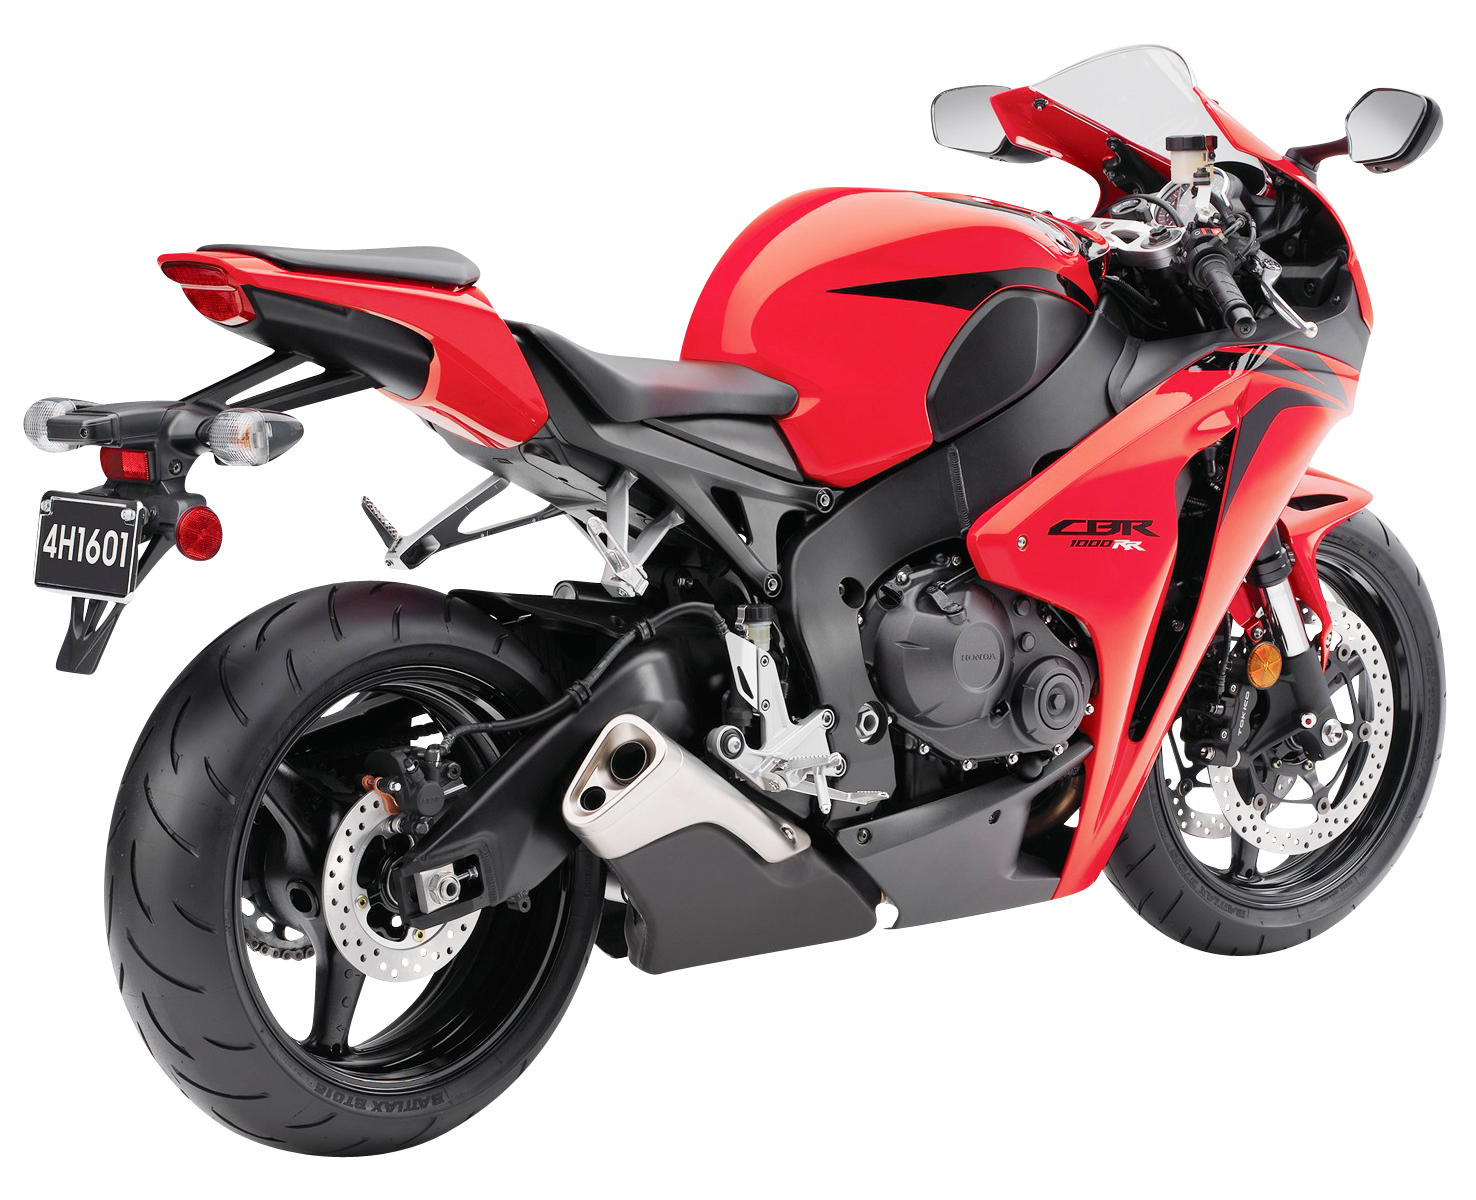 Red Honda CBR 1000RR PNG Image